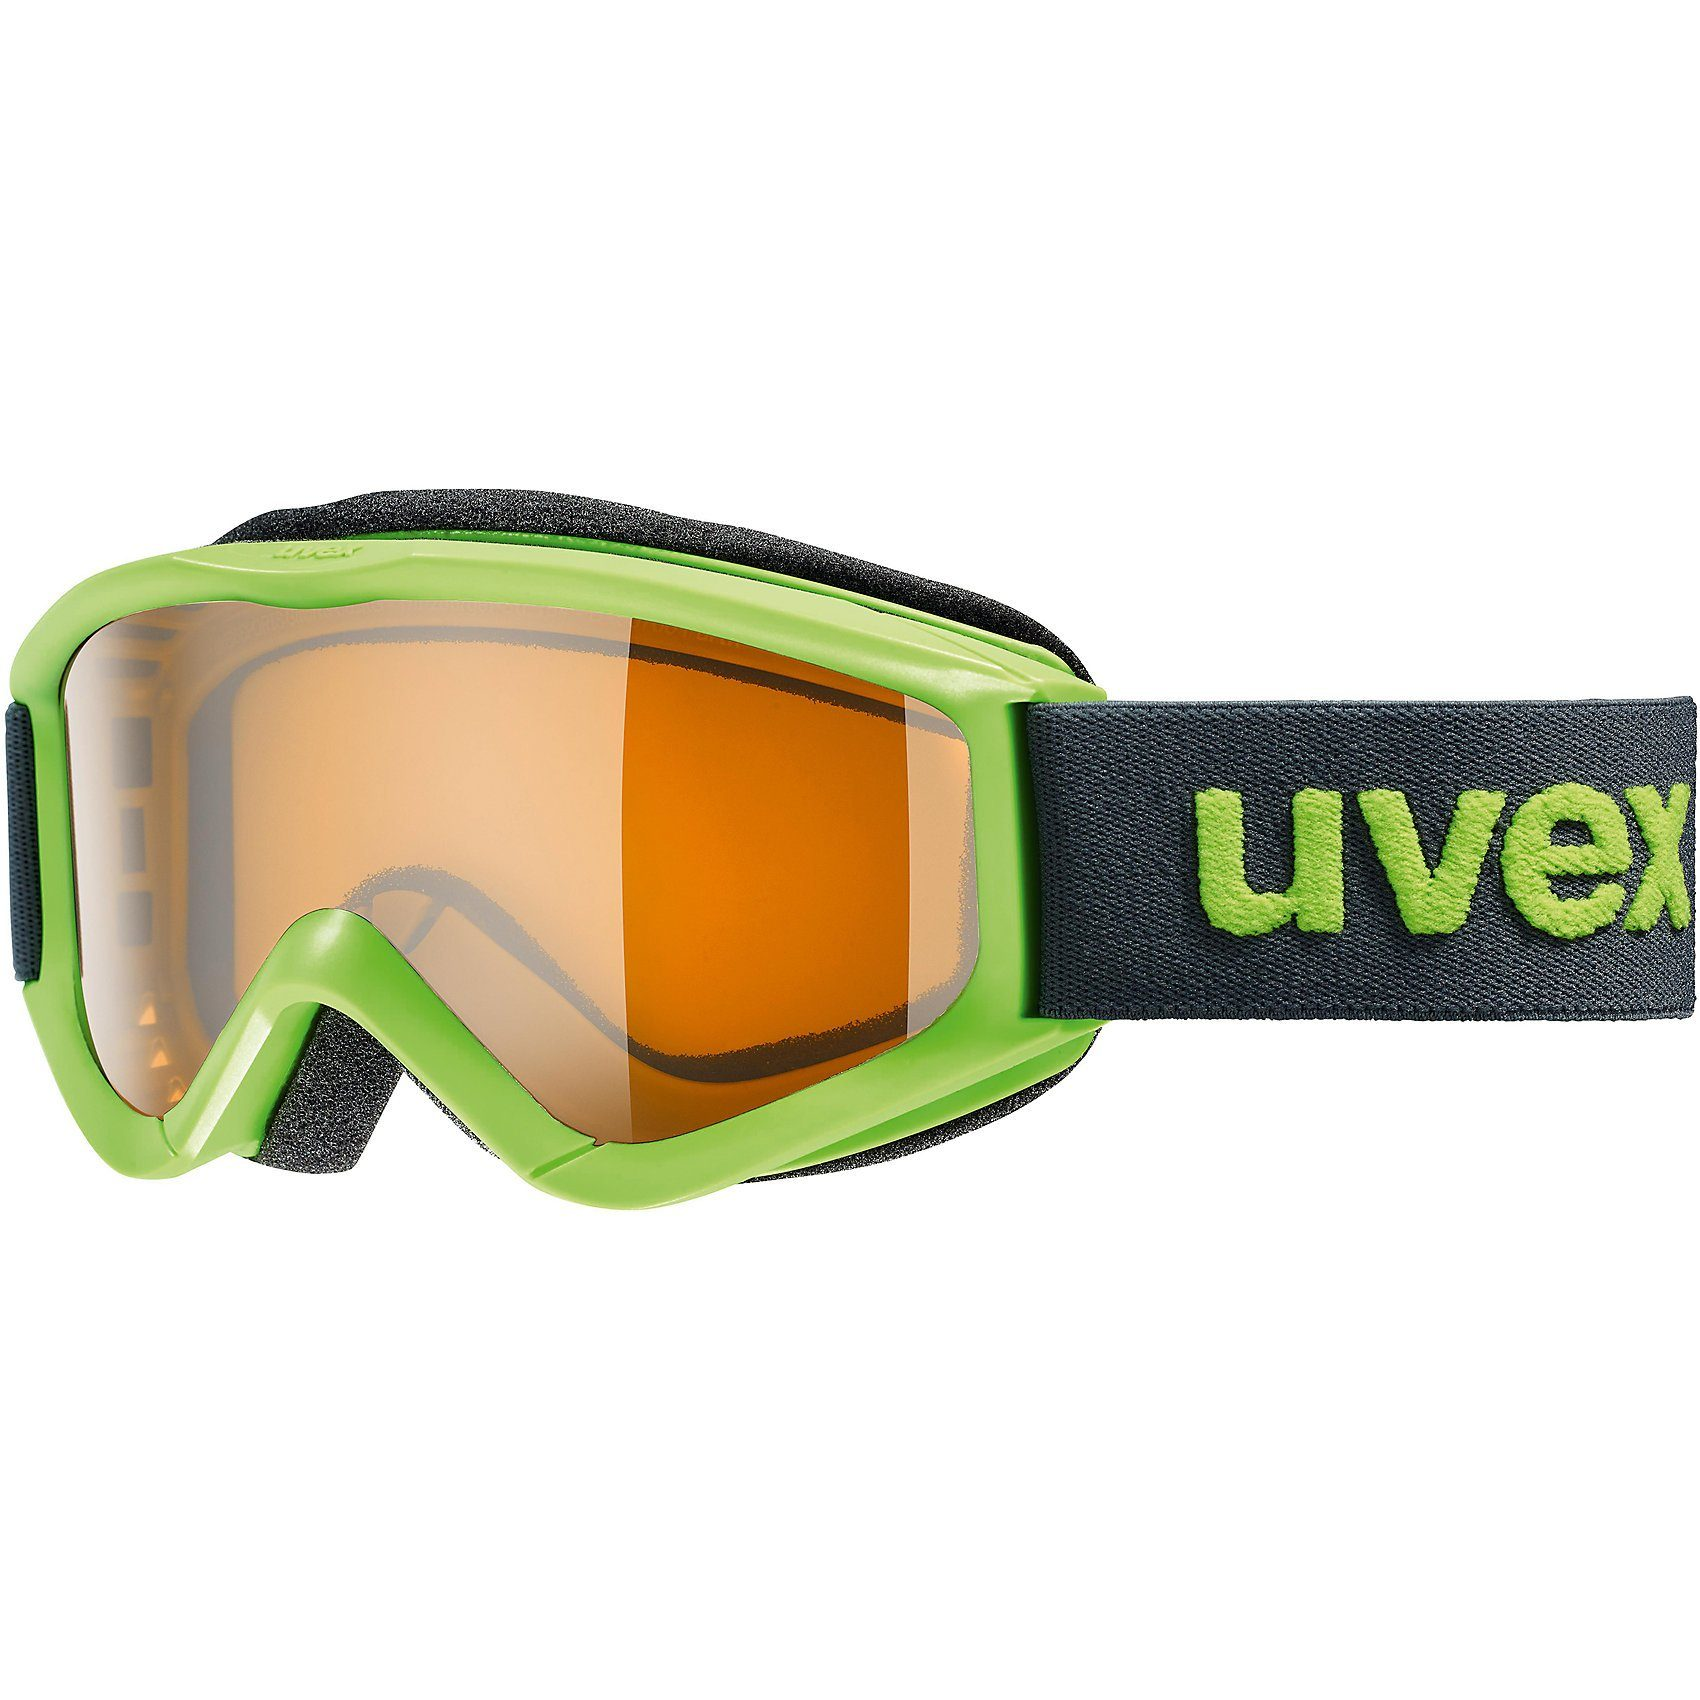 Uvex Skibrille speedy pro, lightgreen sl/lasergold